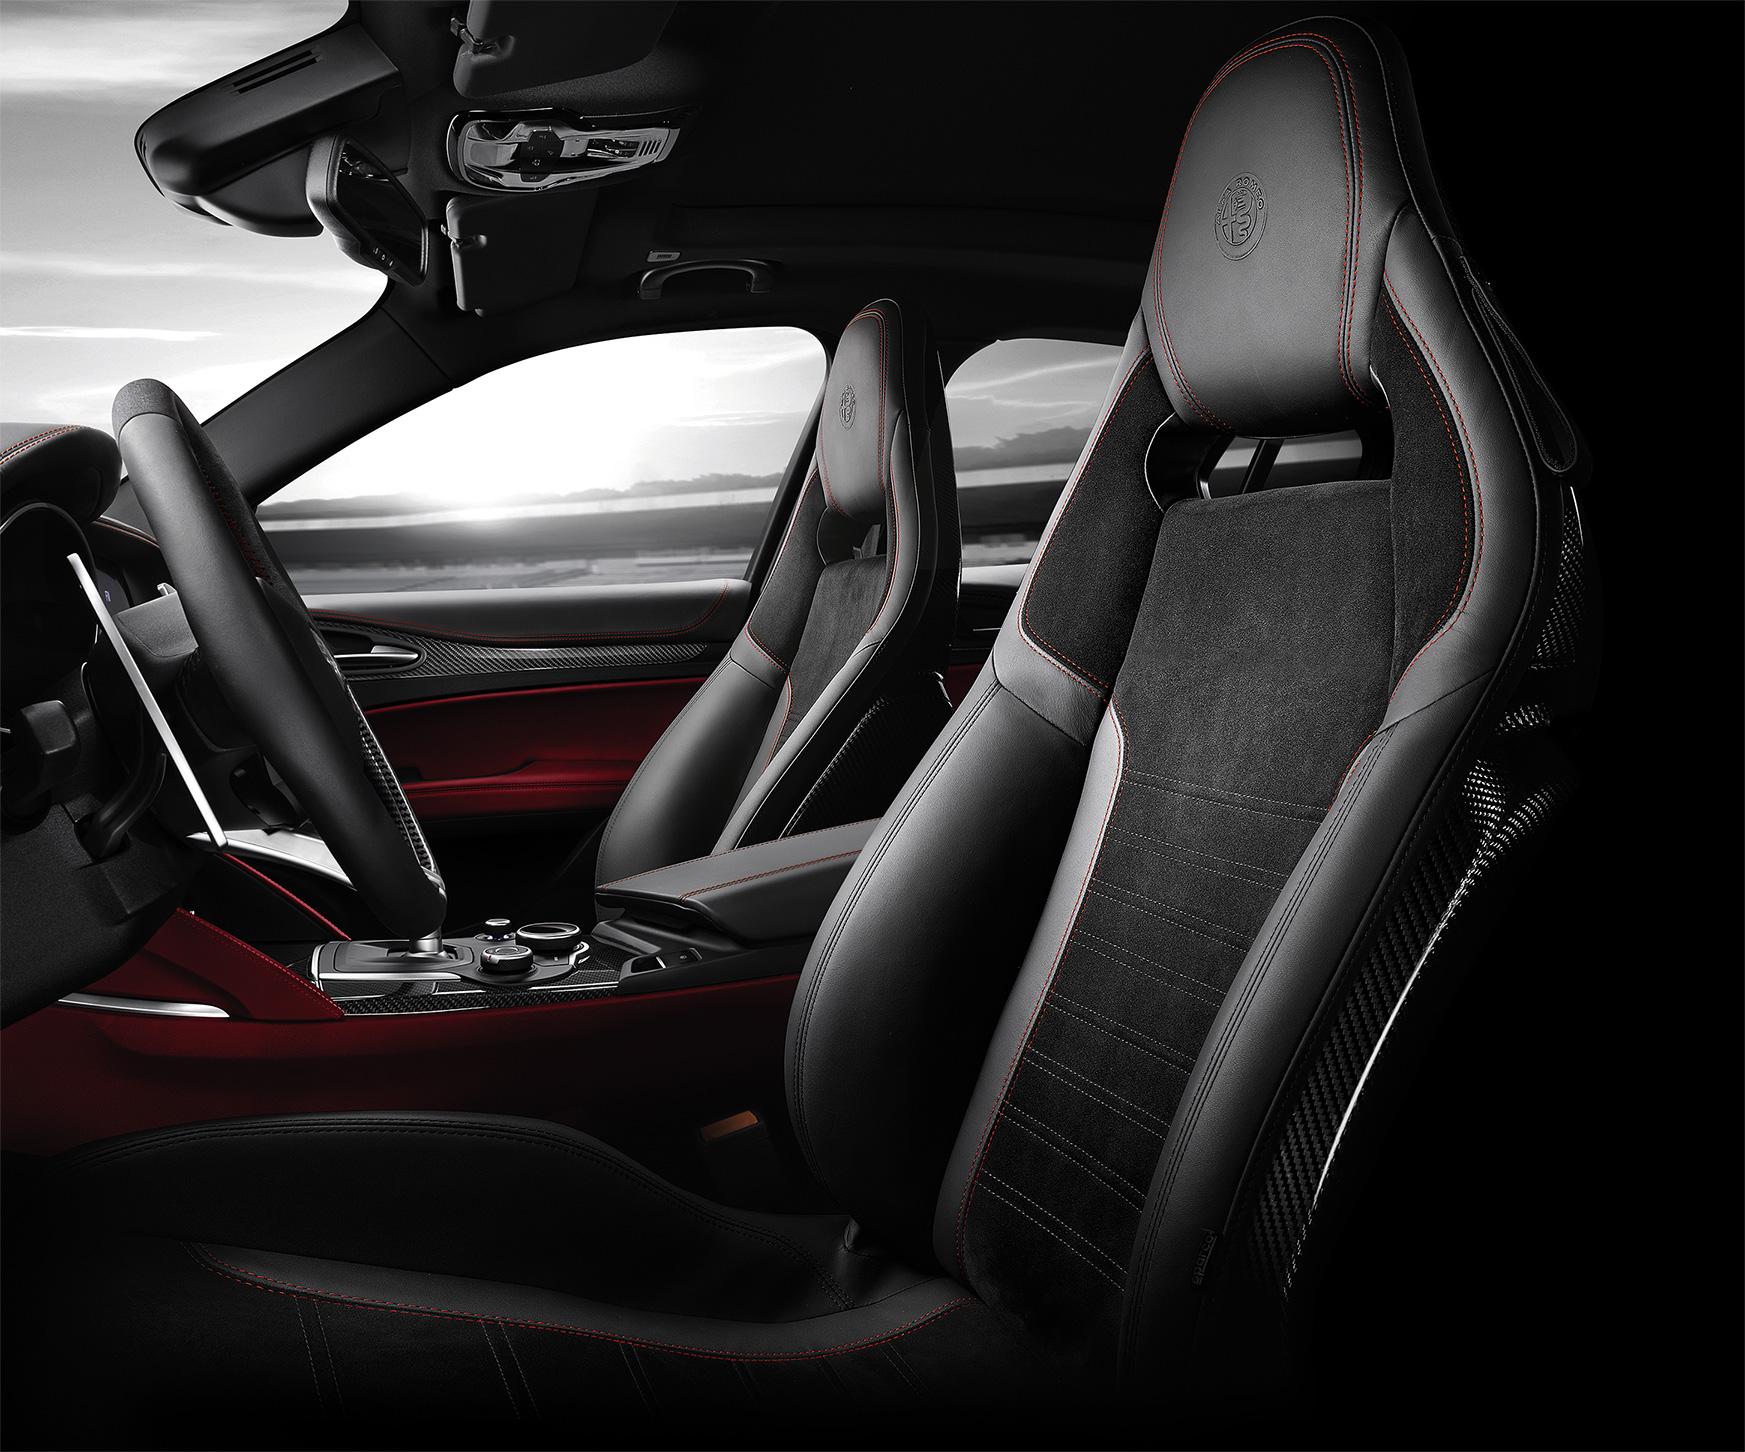 TrackWorthy - Alfa Romeo Interno SetlvioQ NR